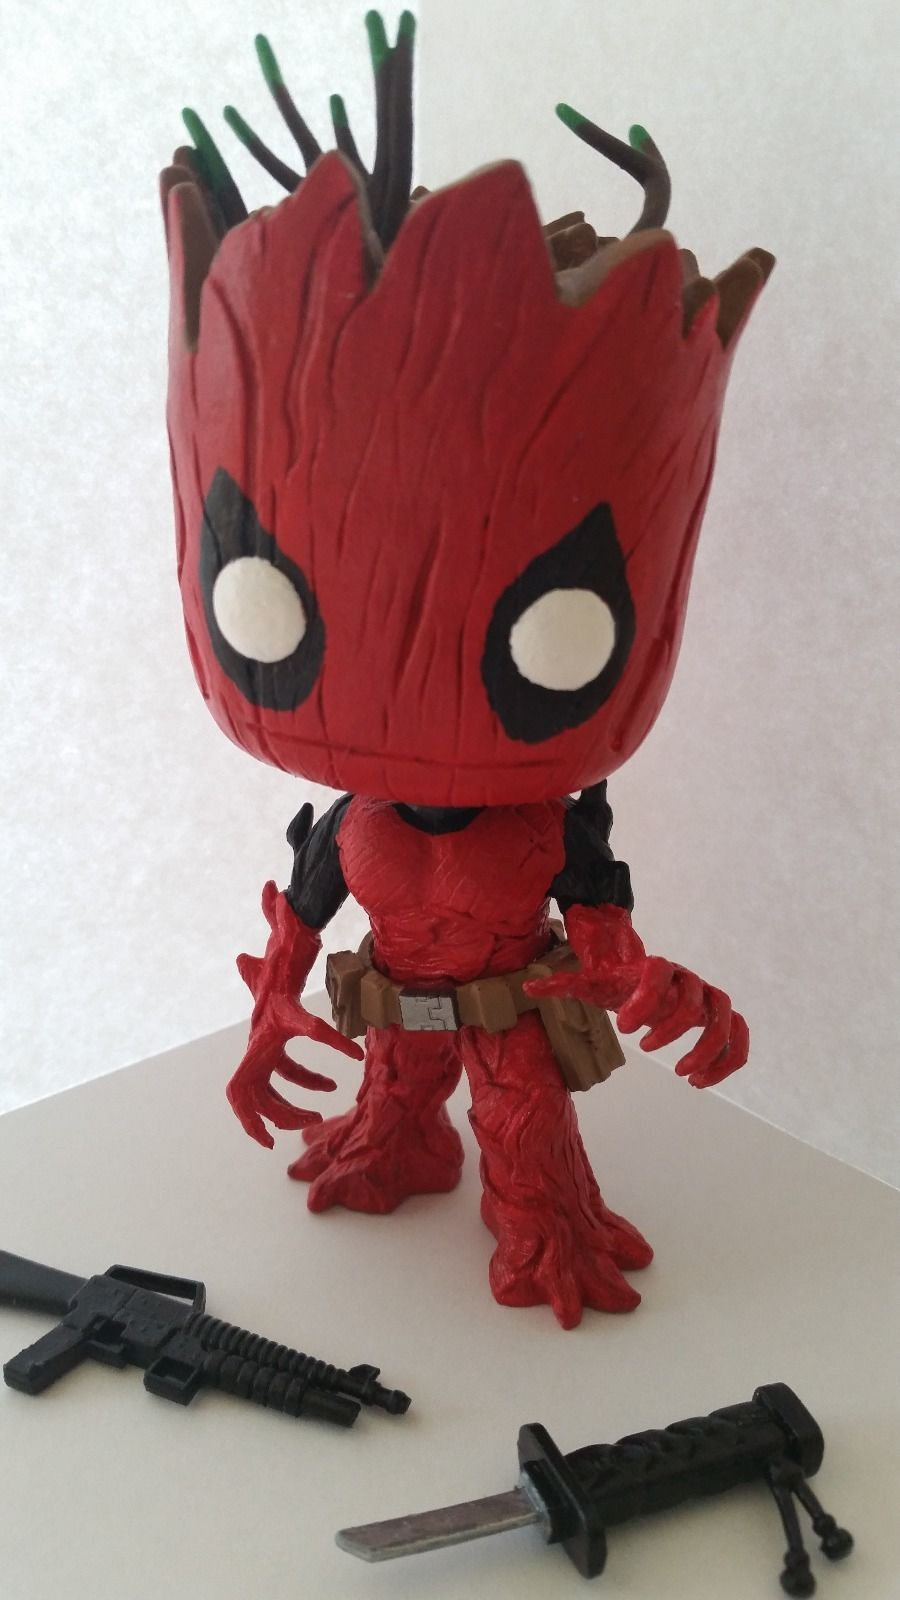 40688ceb78f Funko Pop Groot Deadpool 49 Dbeck Customs Interchangeable Weapons